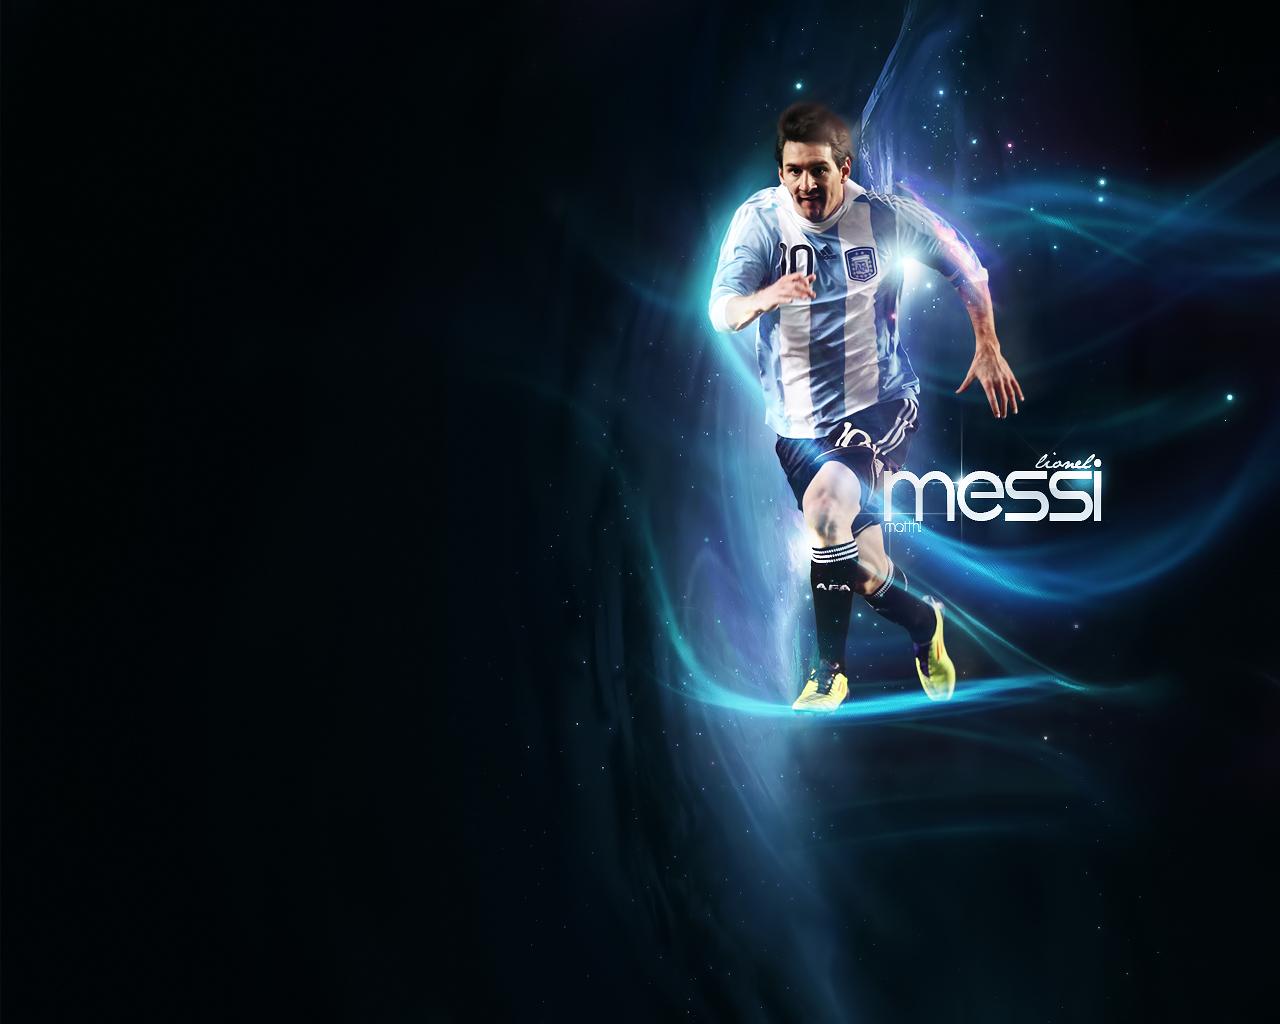 Lionel Messi HD Wallpapers 1080p   Football Wallpaper HD Football 1280x1024